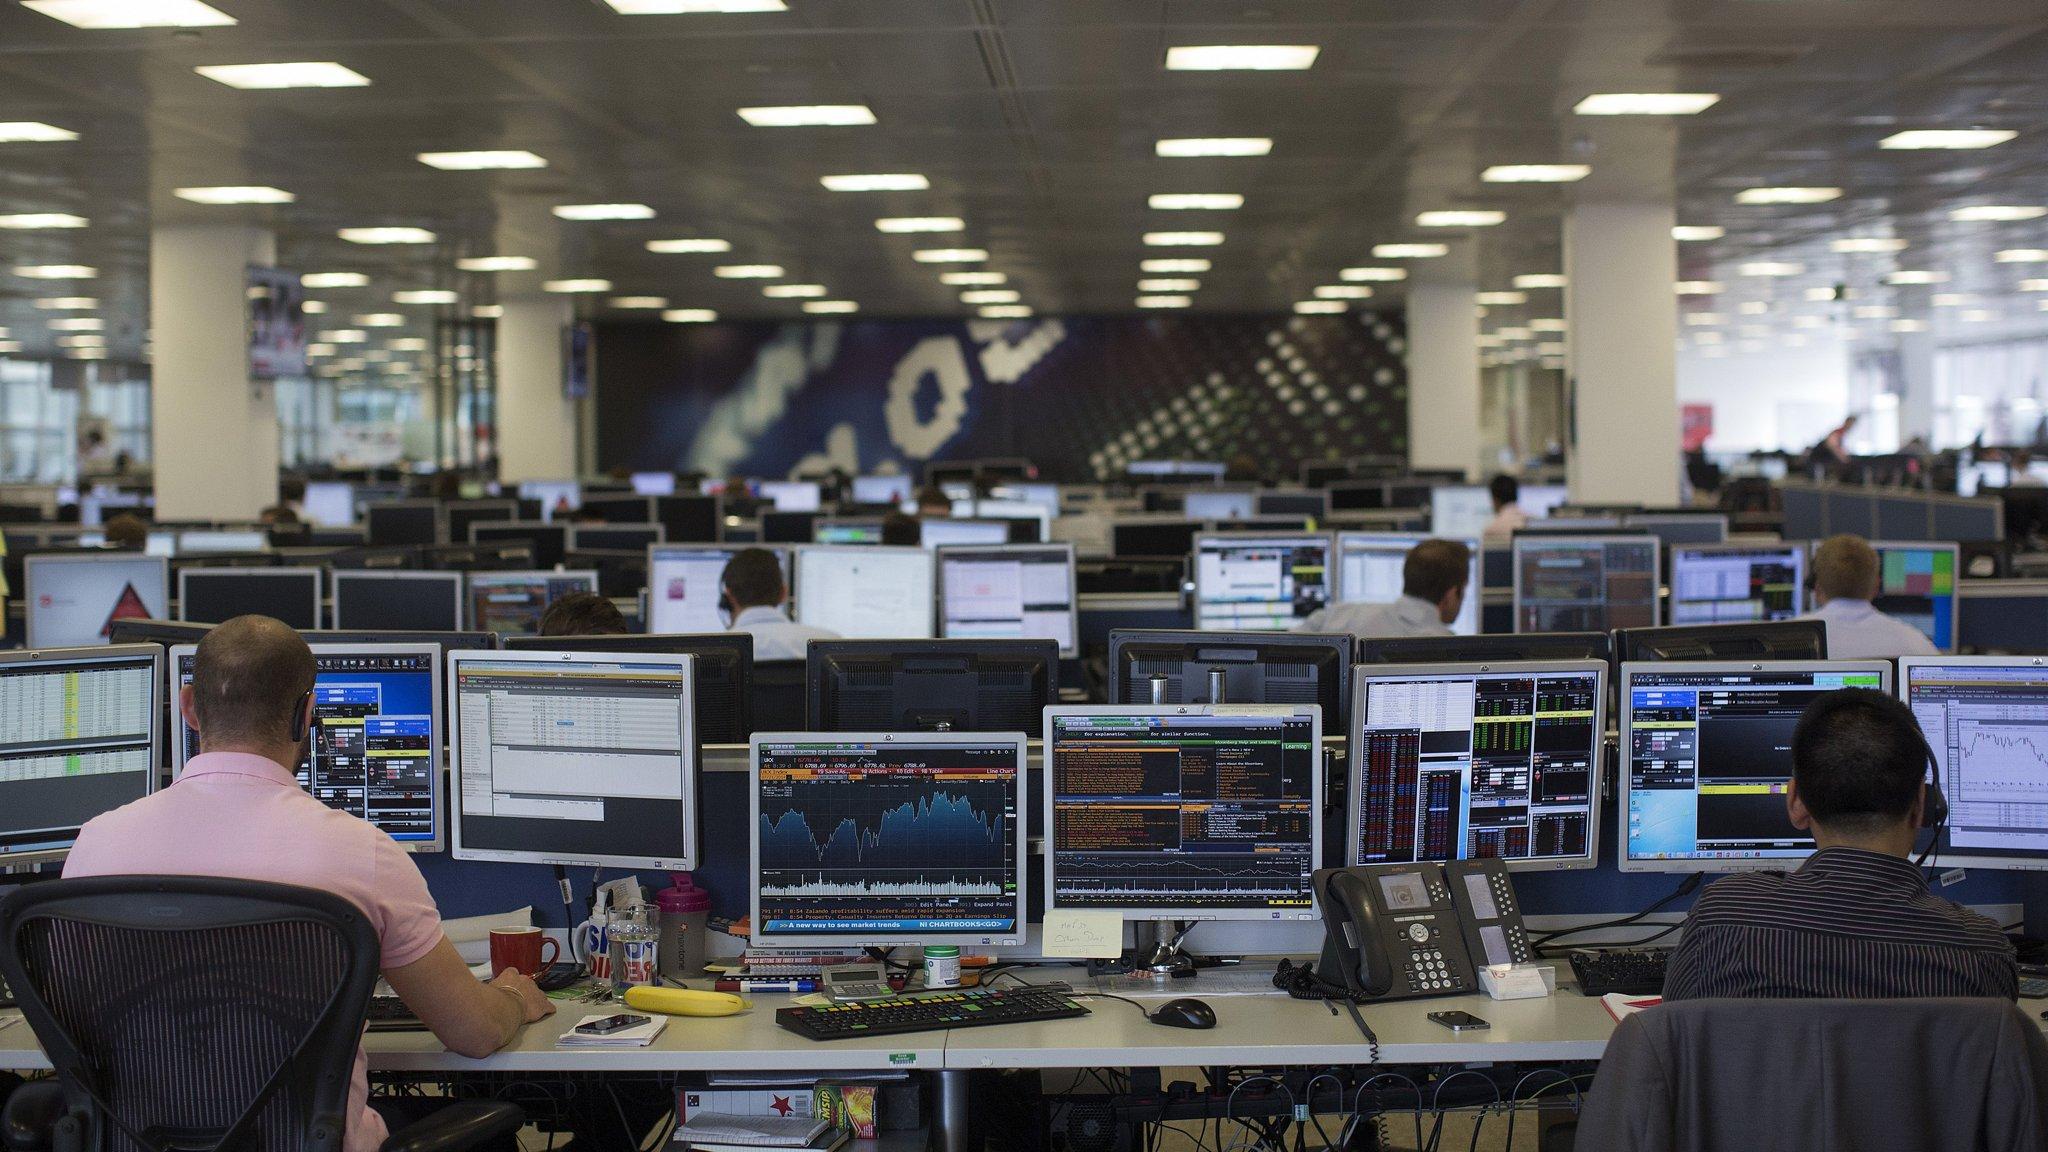 Big data analysis to transform insurance industry